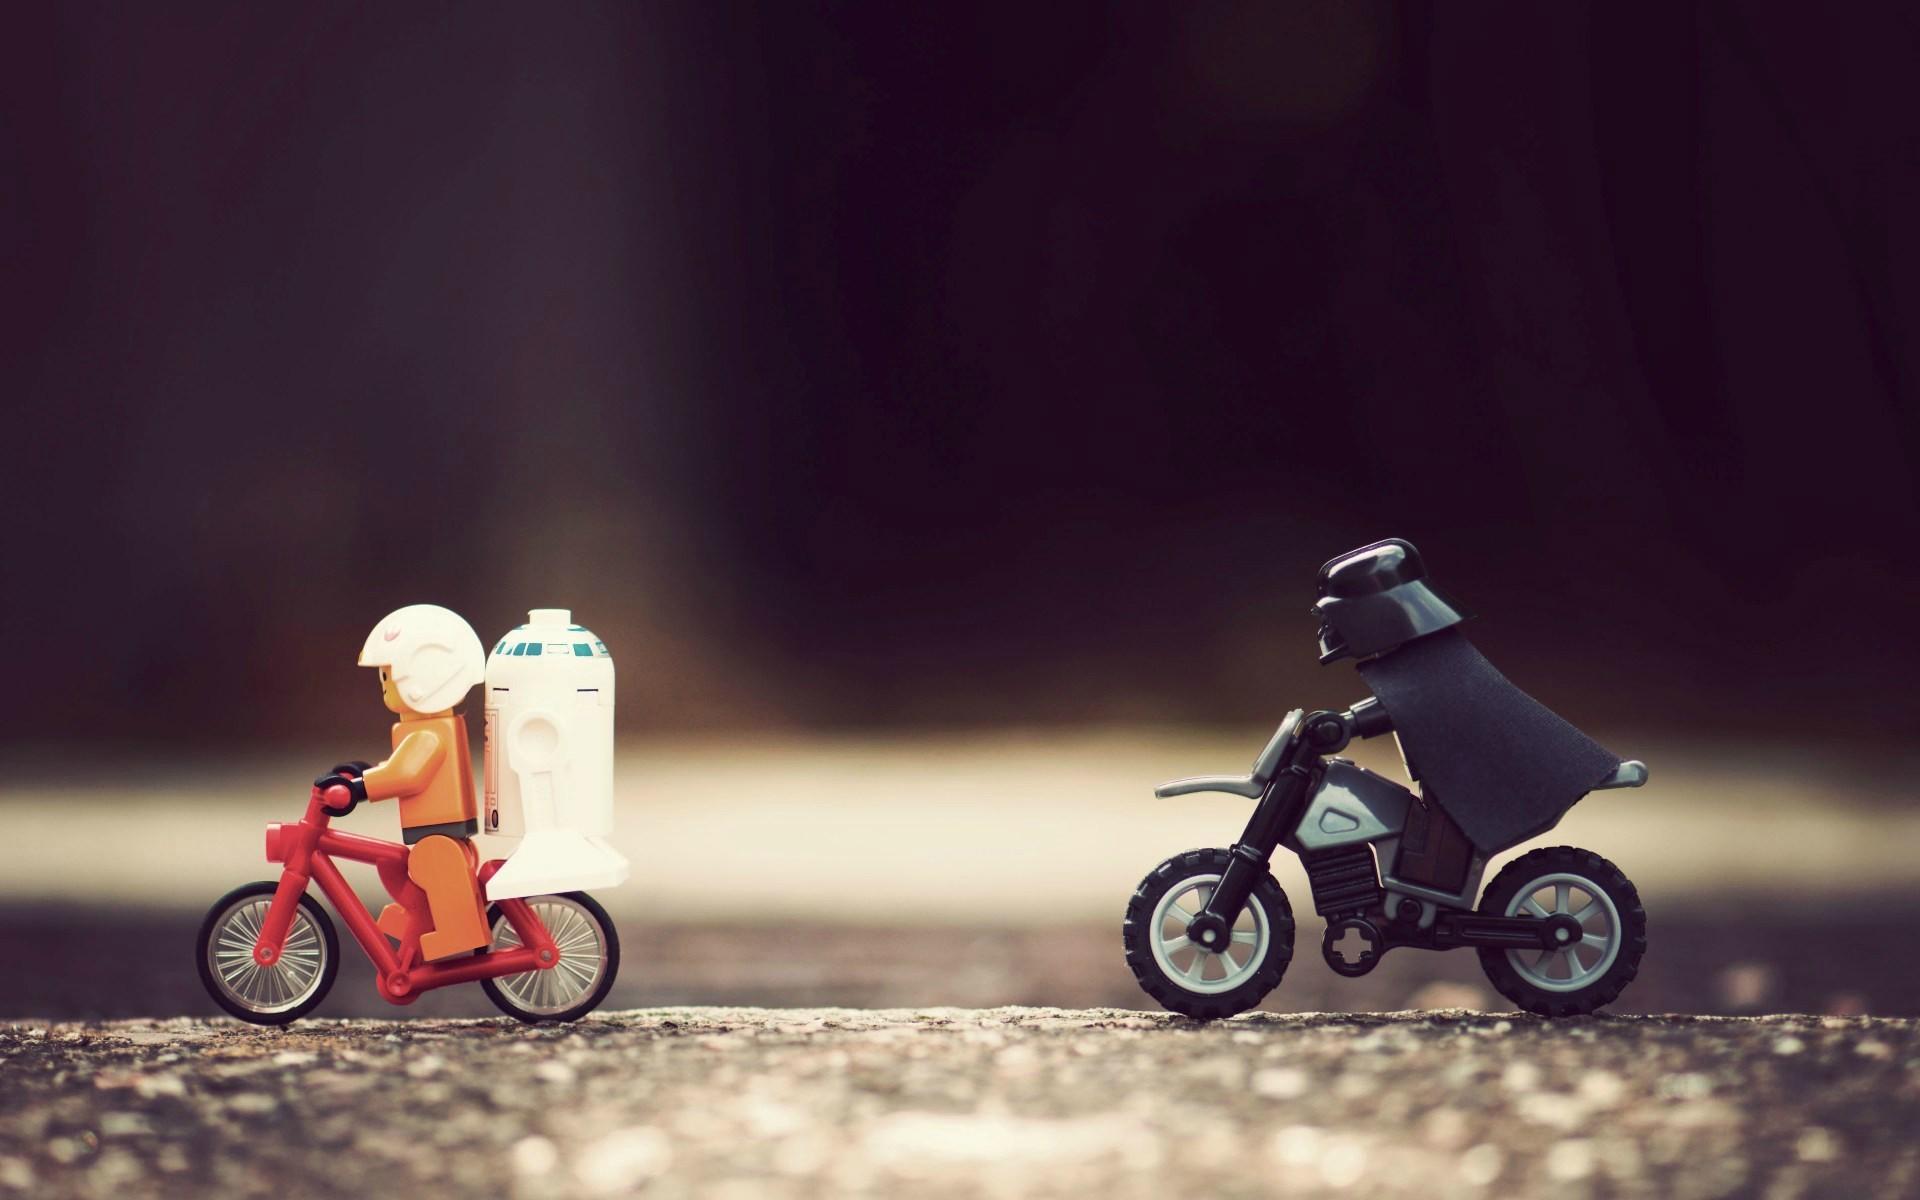 Wallpaper Star Wars Toys Humor Vehicle R2 D2 Darth Vader